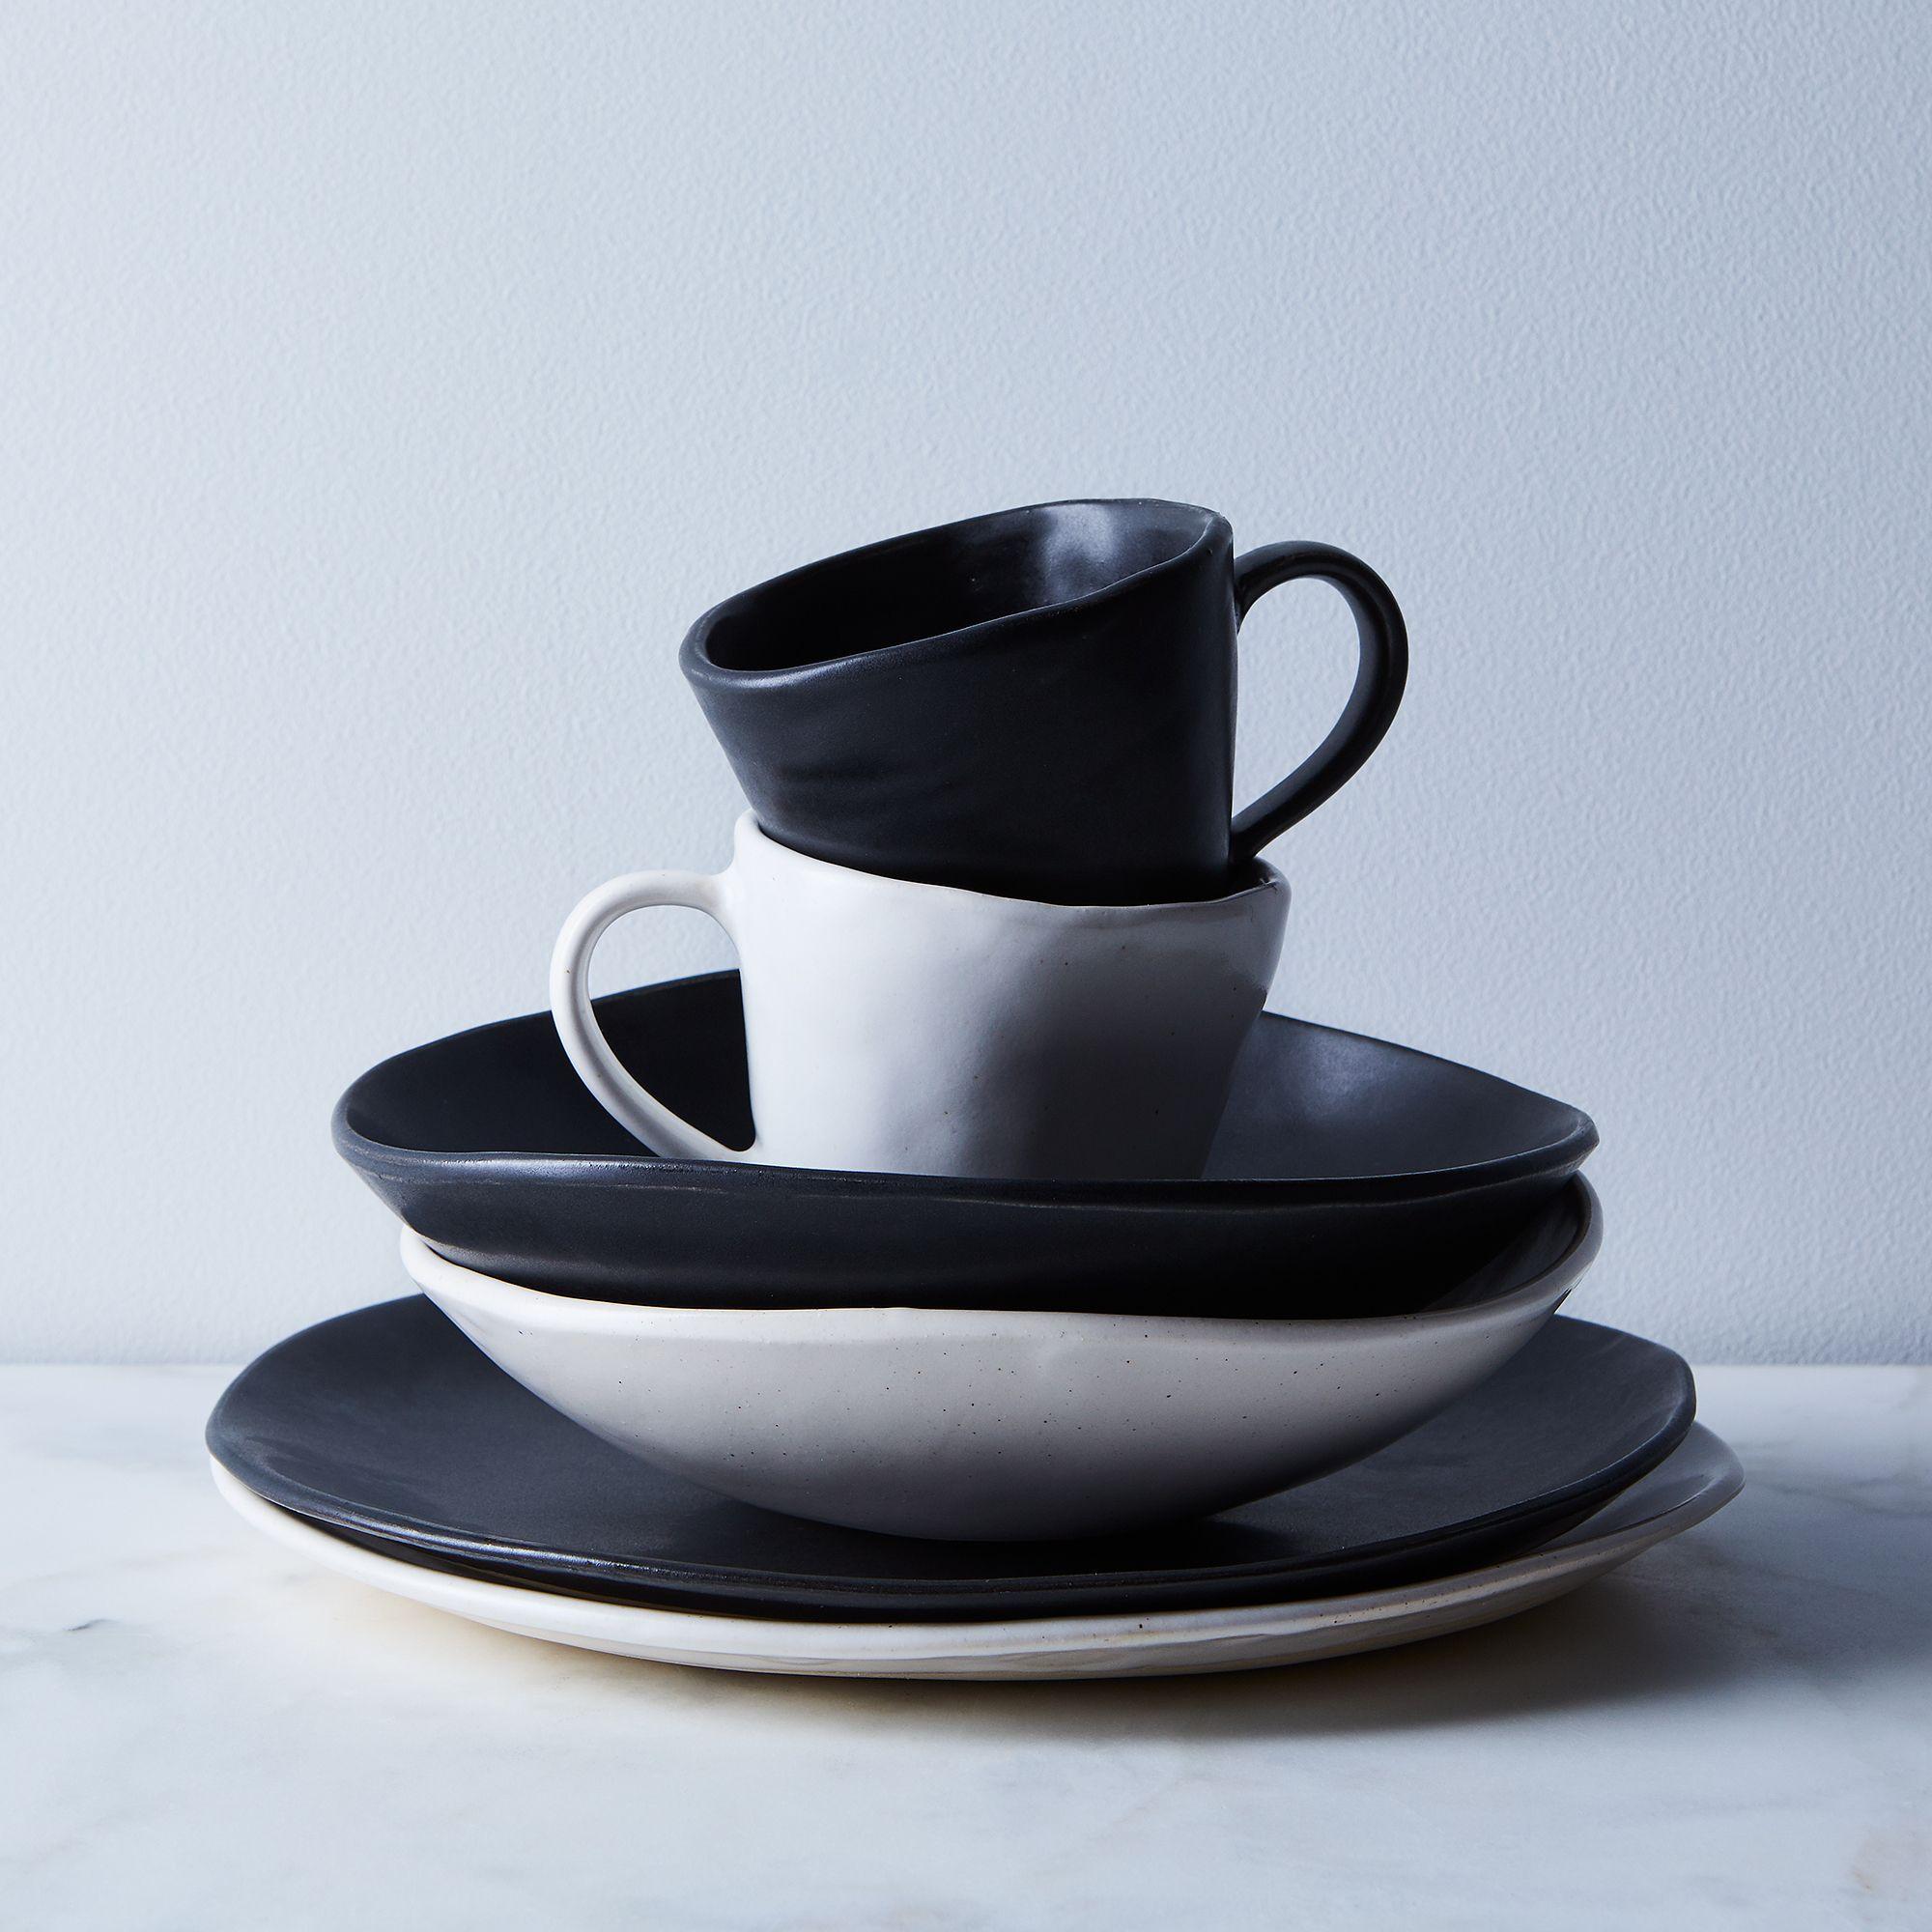 Ceramic Dinnerware.jpg